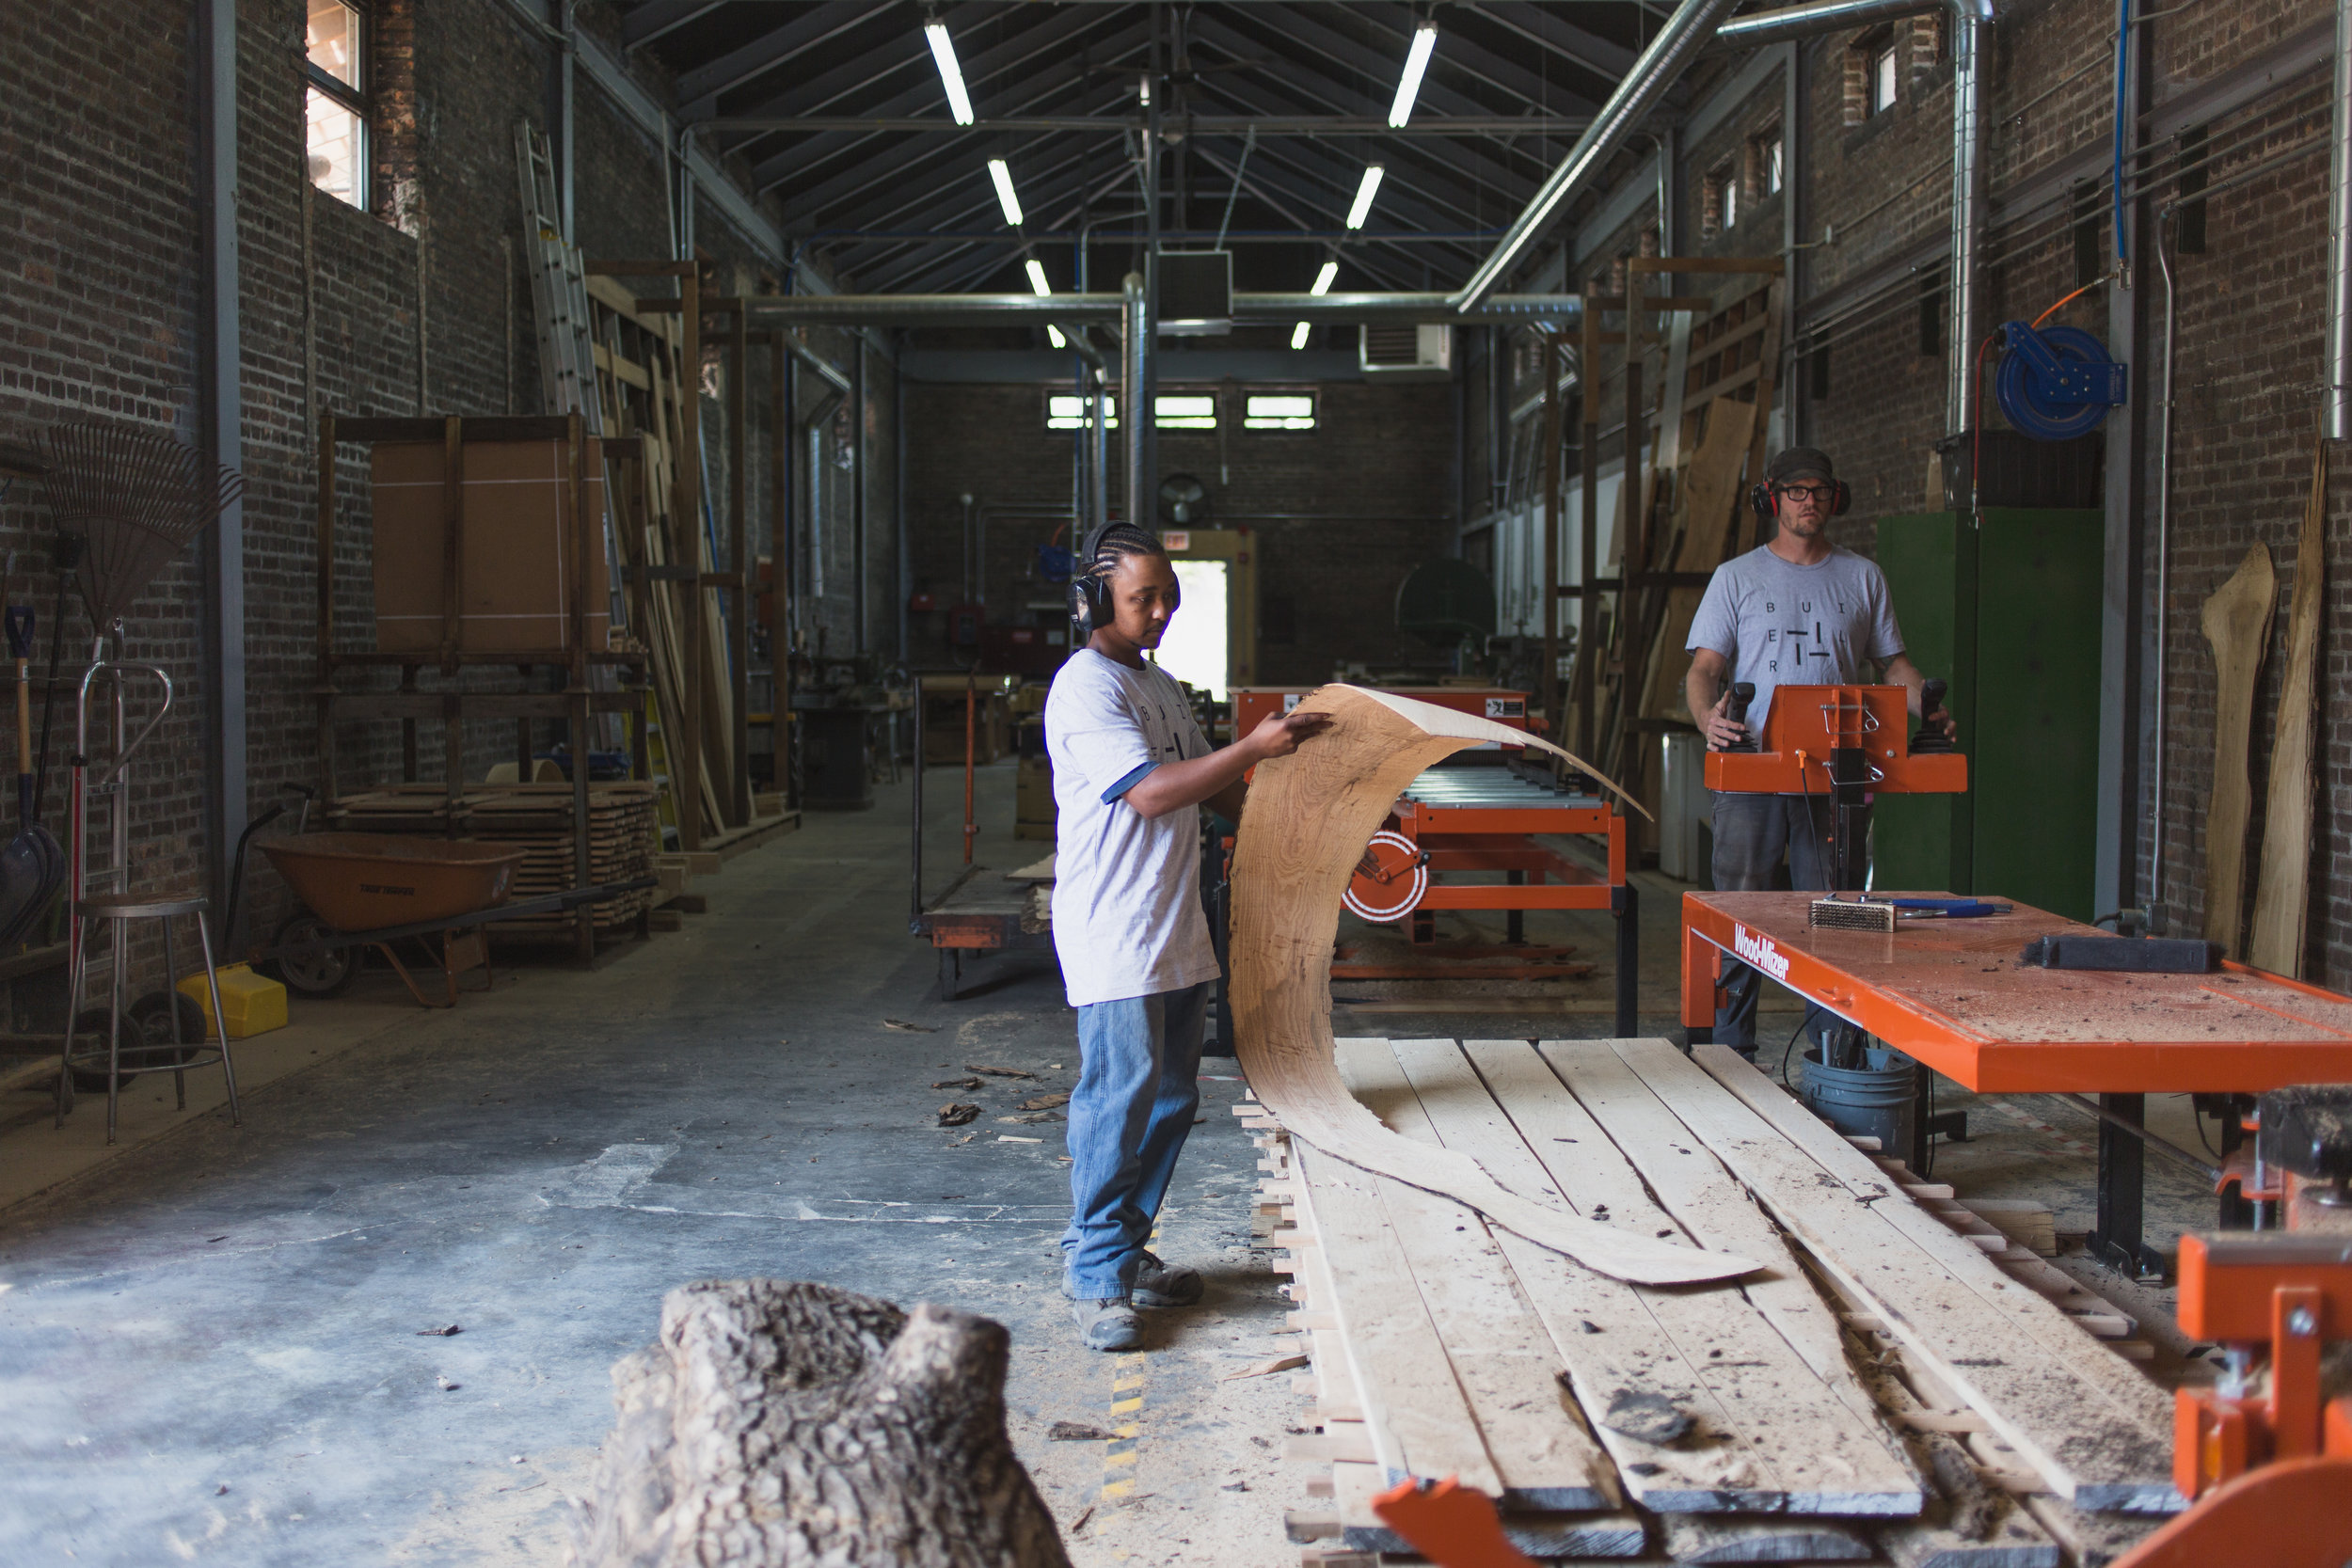 Workforce Development Program, Mill, Rebuild Foundation, Photo: David C. Sampson.